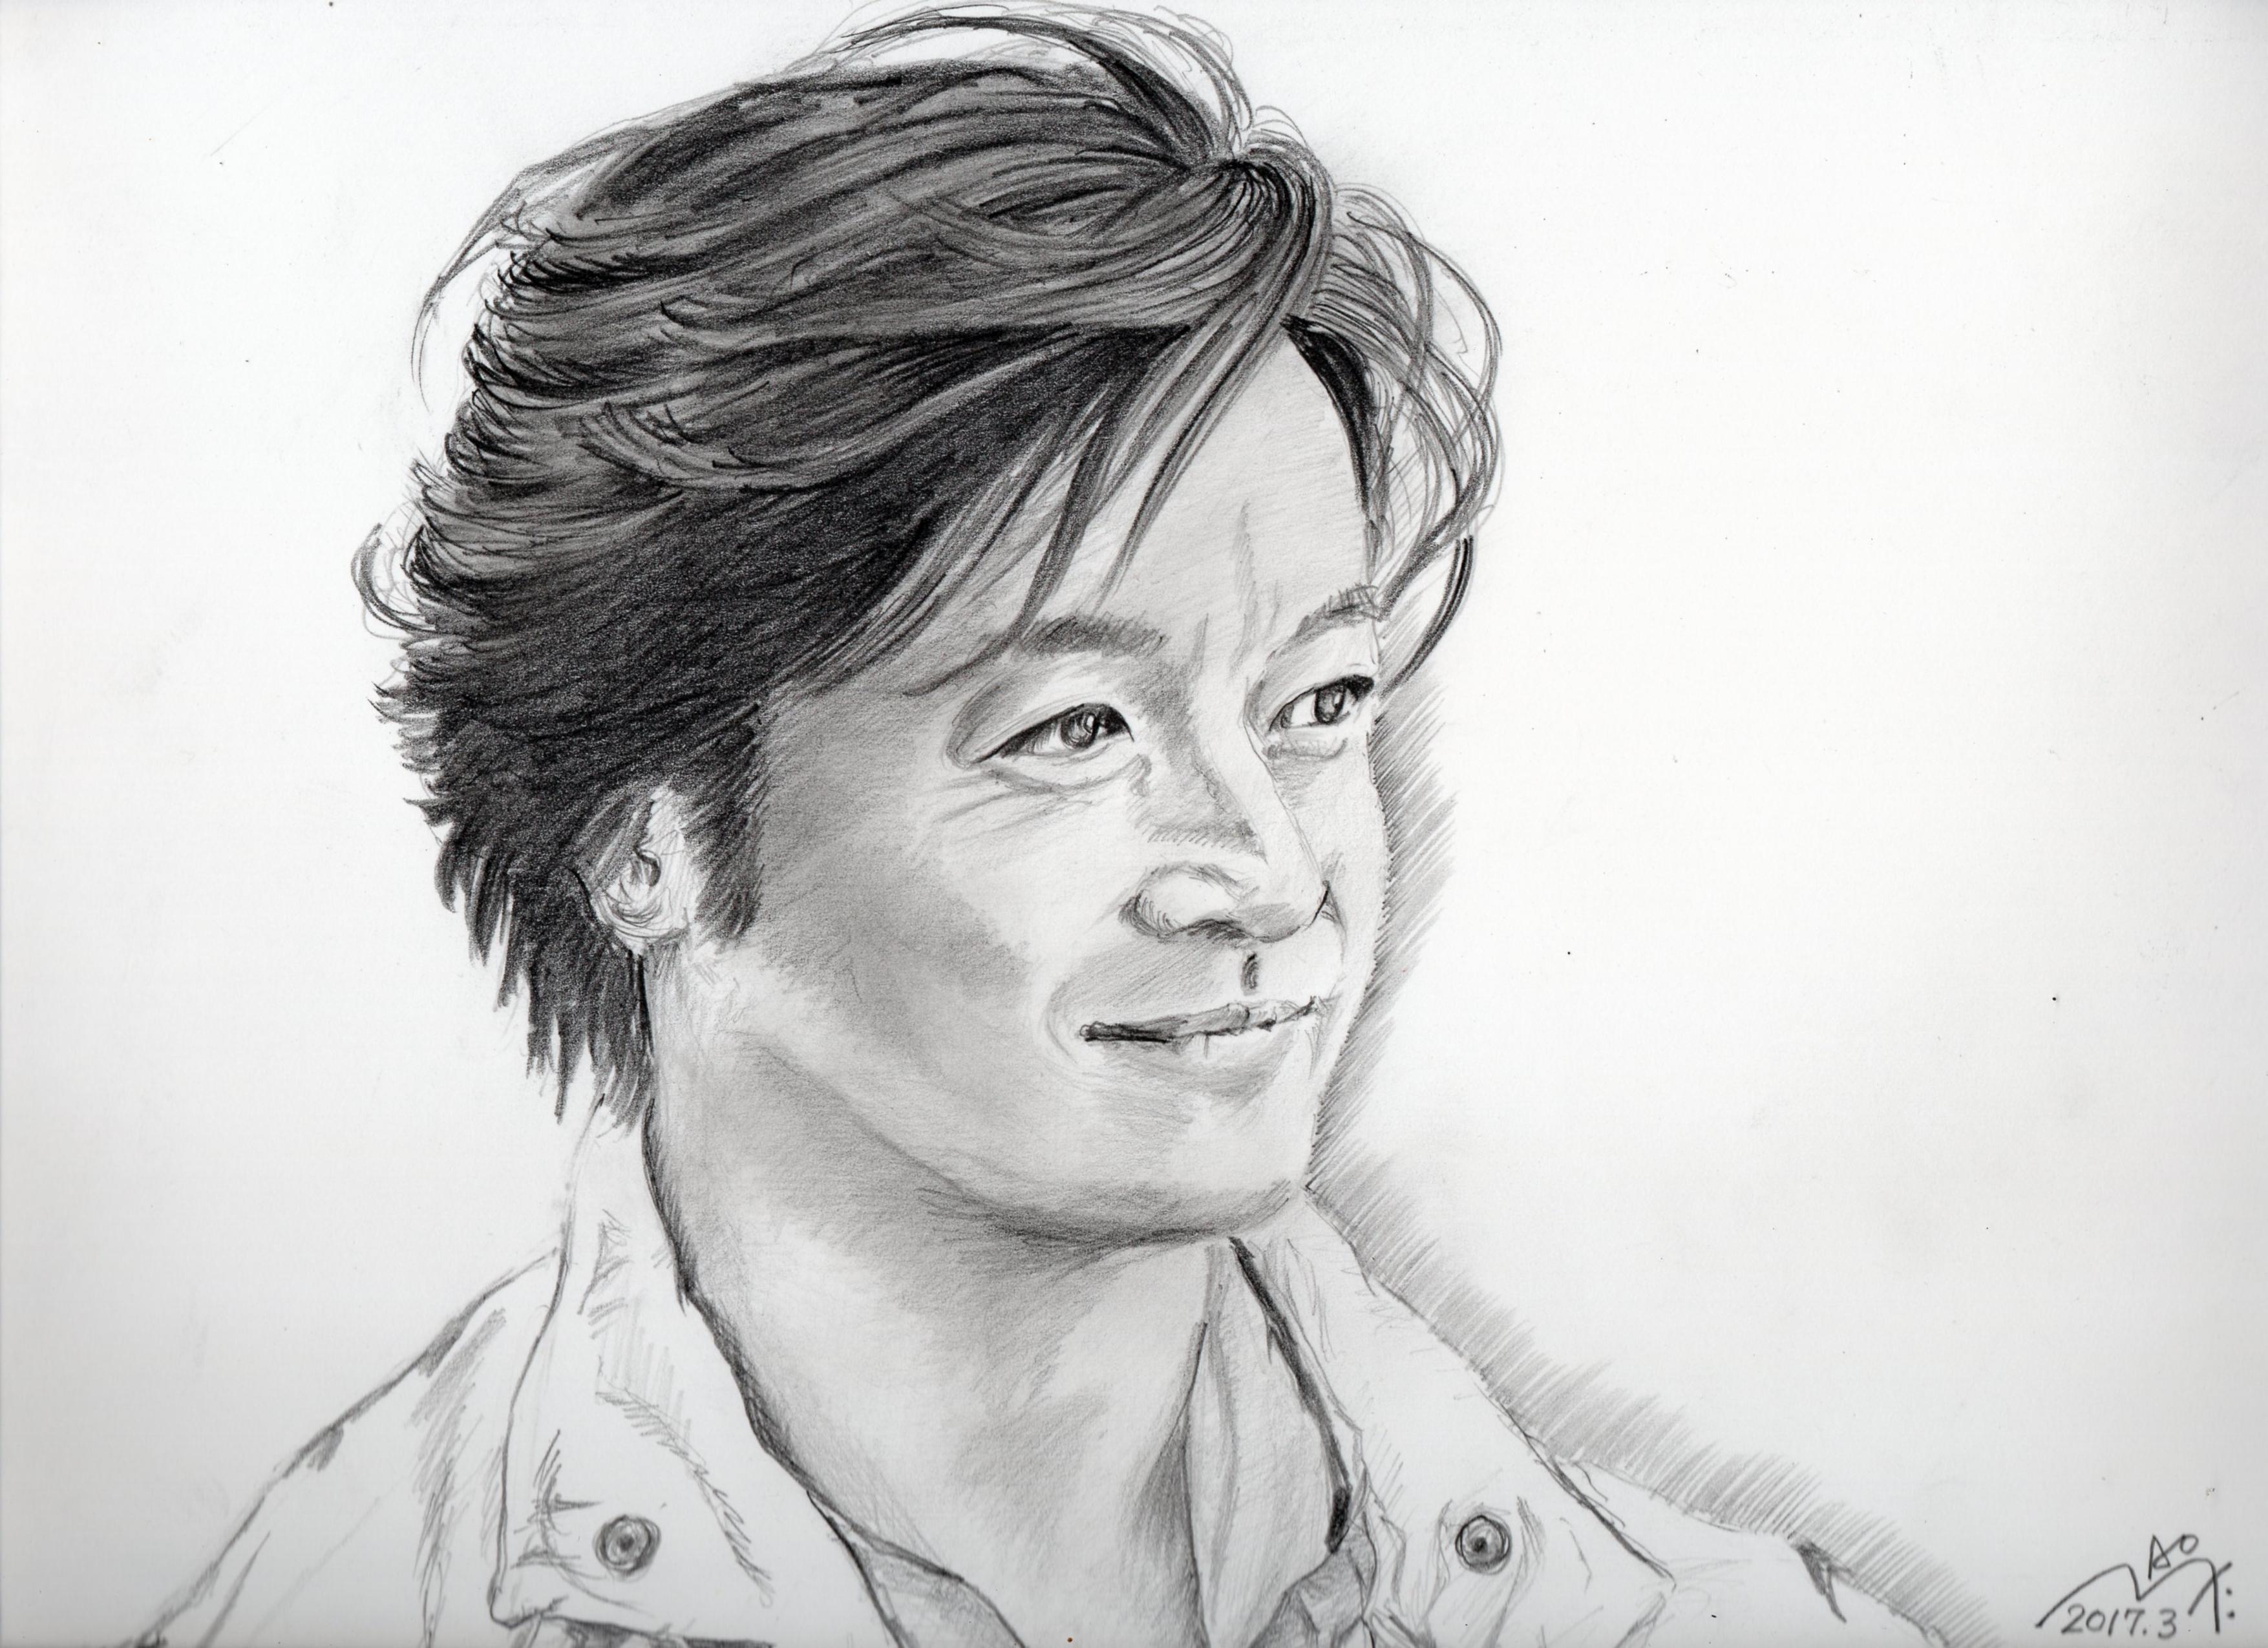 石丸 幹二の鉛筆画似顔絵